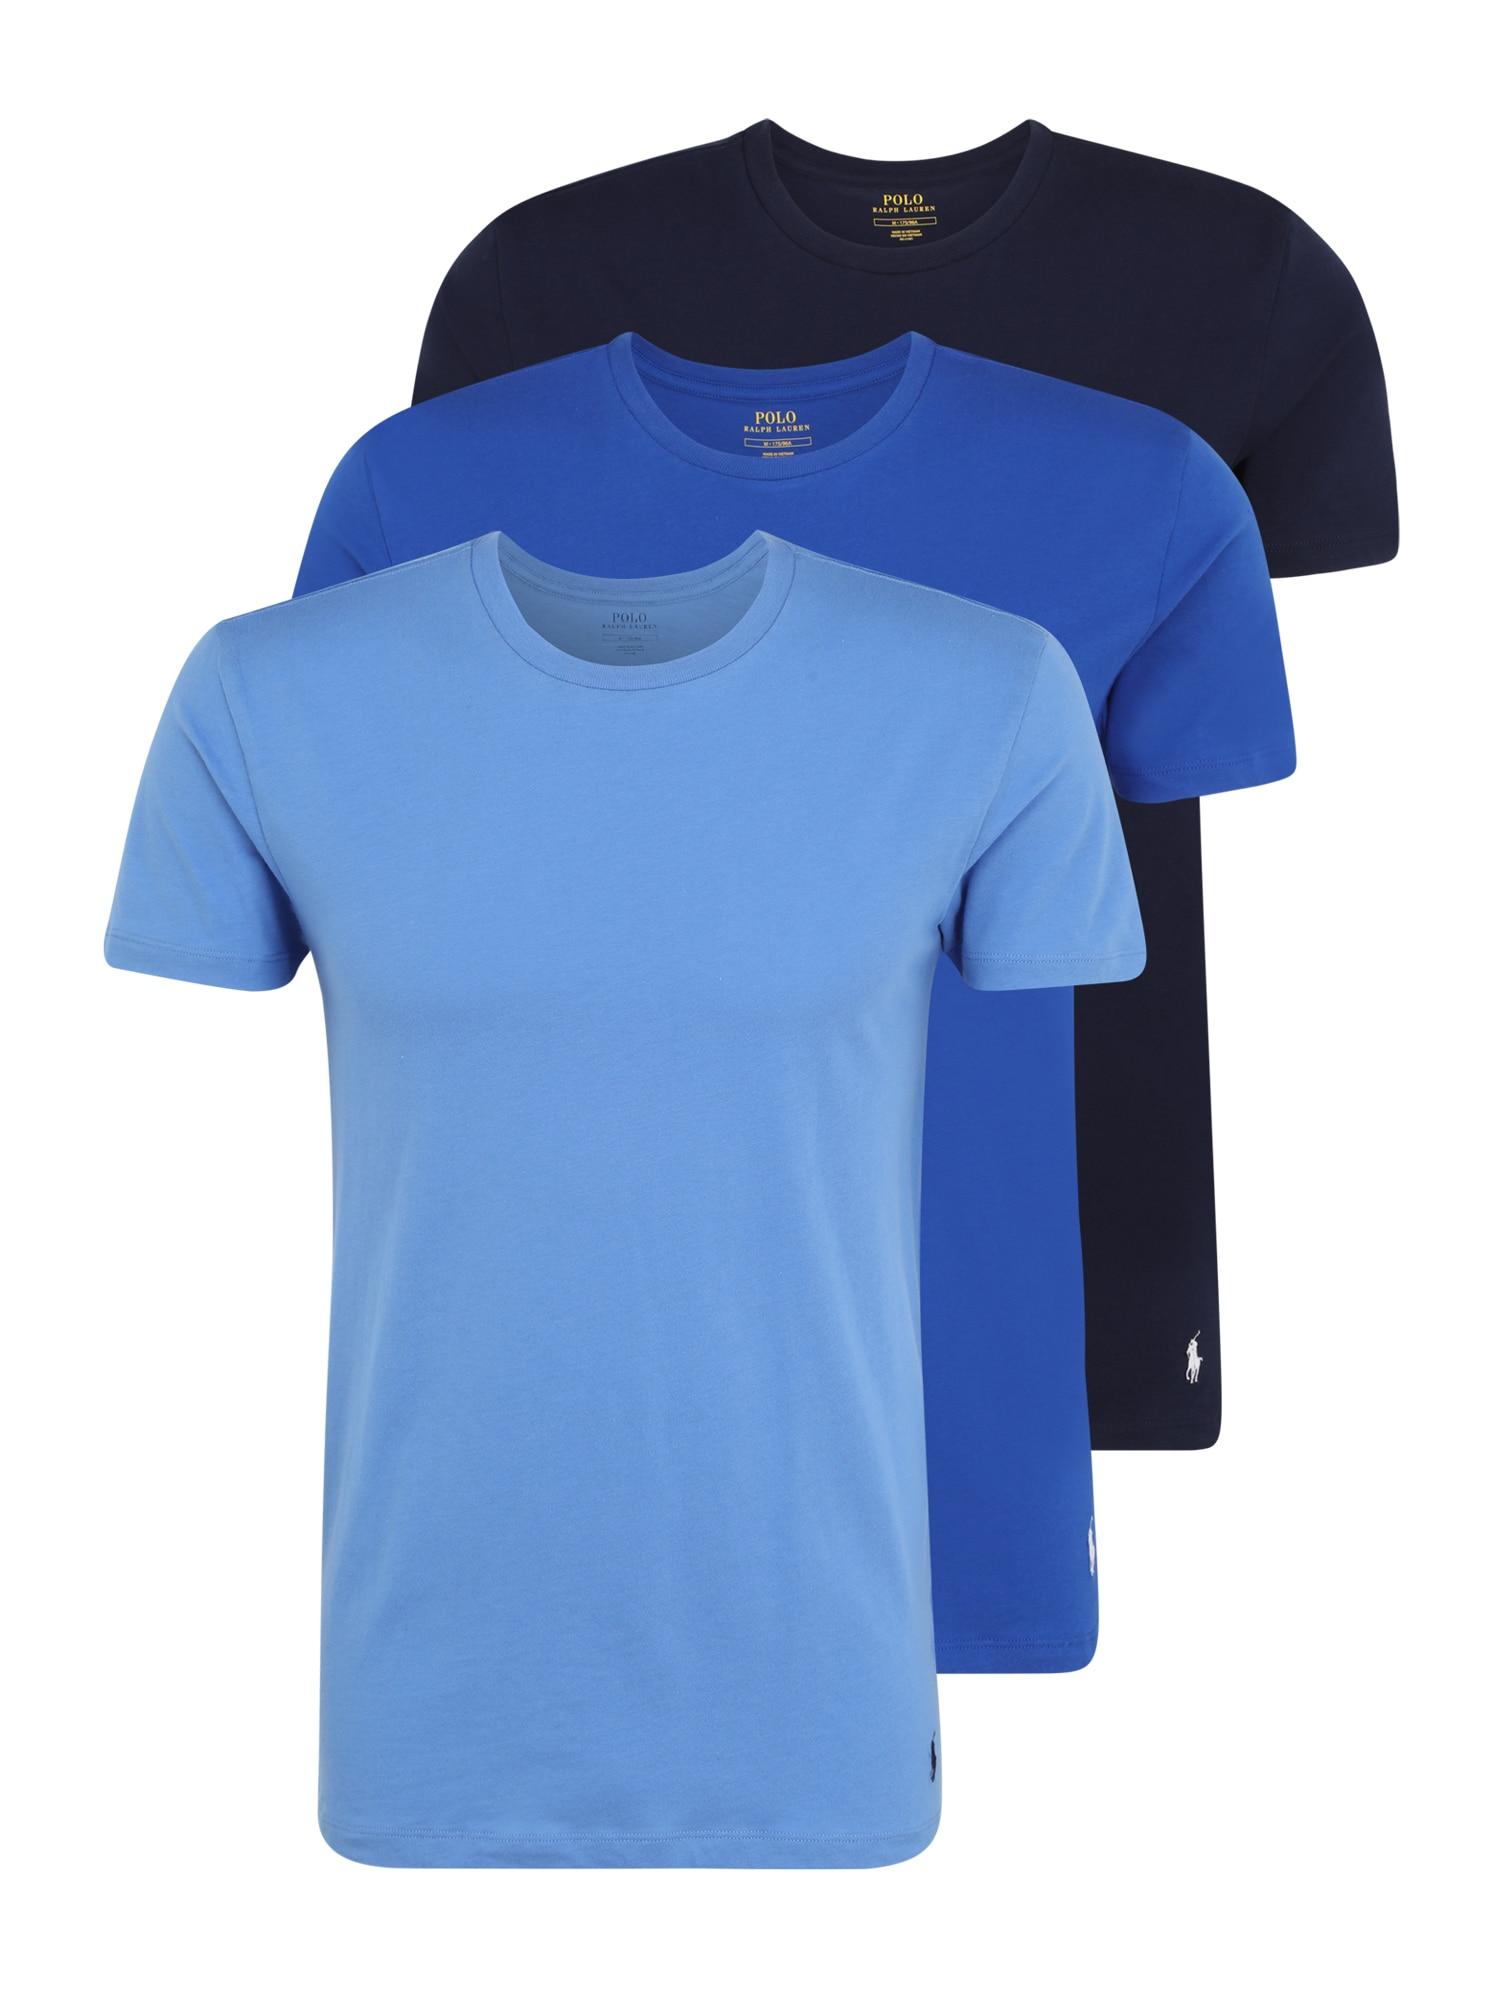 POLO RALPH LAUREN Apatiniai marškinėliai mėlyna dūmų spalva / mėlyna / nakties mėlyna